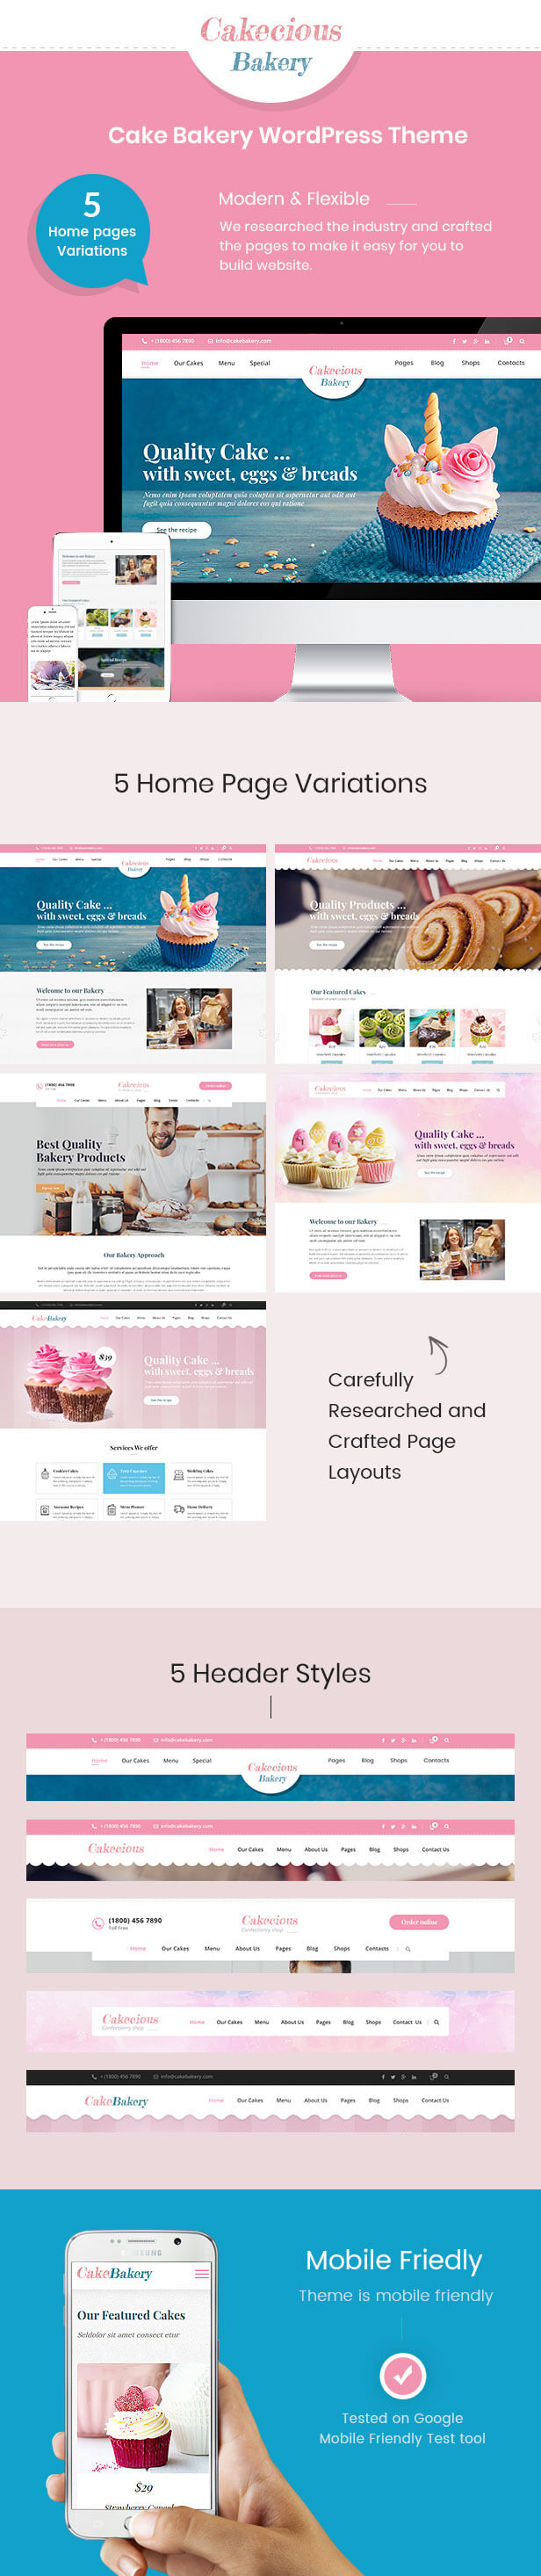 Cakecious - Cake Bakery Food WordPress Theme - 3